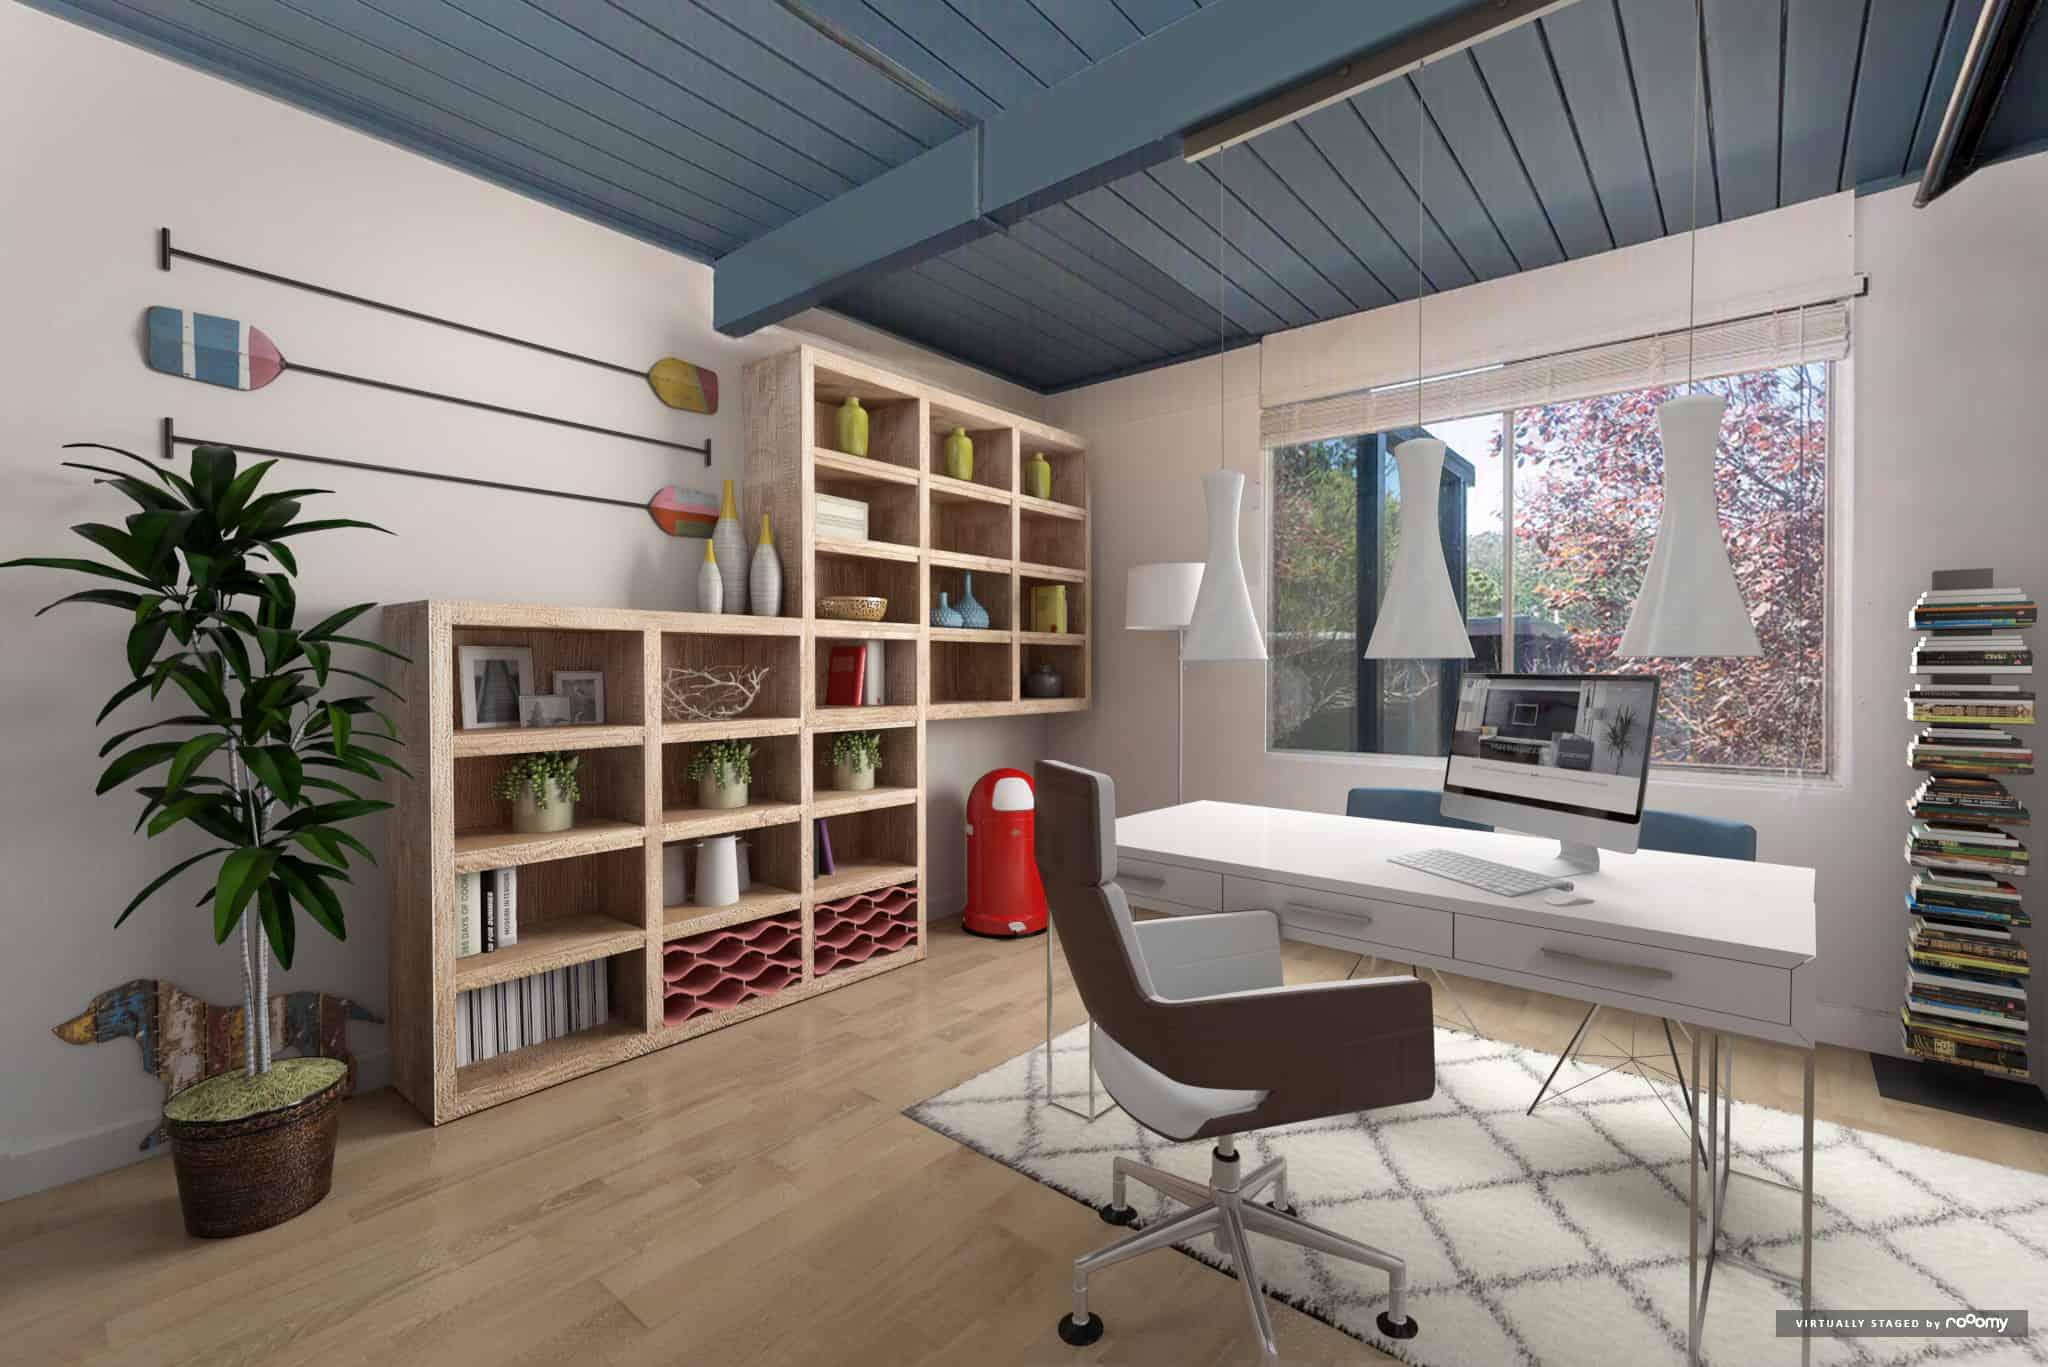 Virtual Flooring Capabilities On Ios Platform By Rooomy: virtual flooring